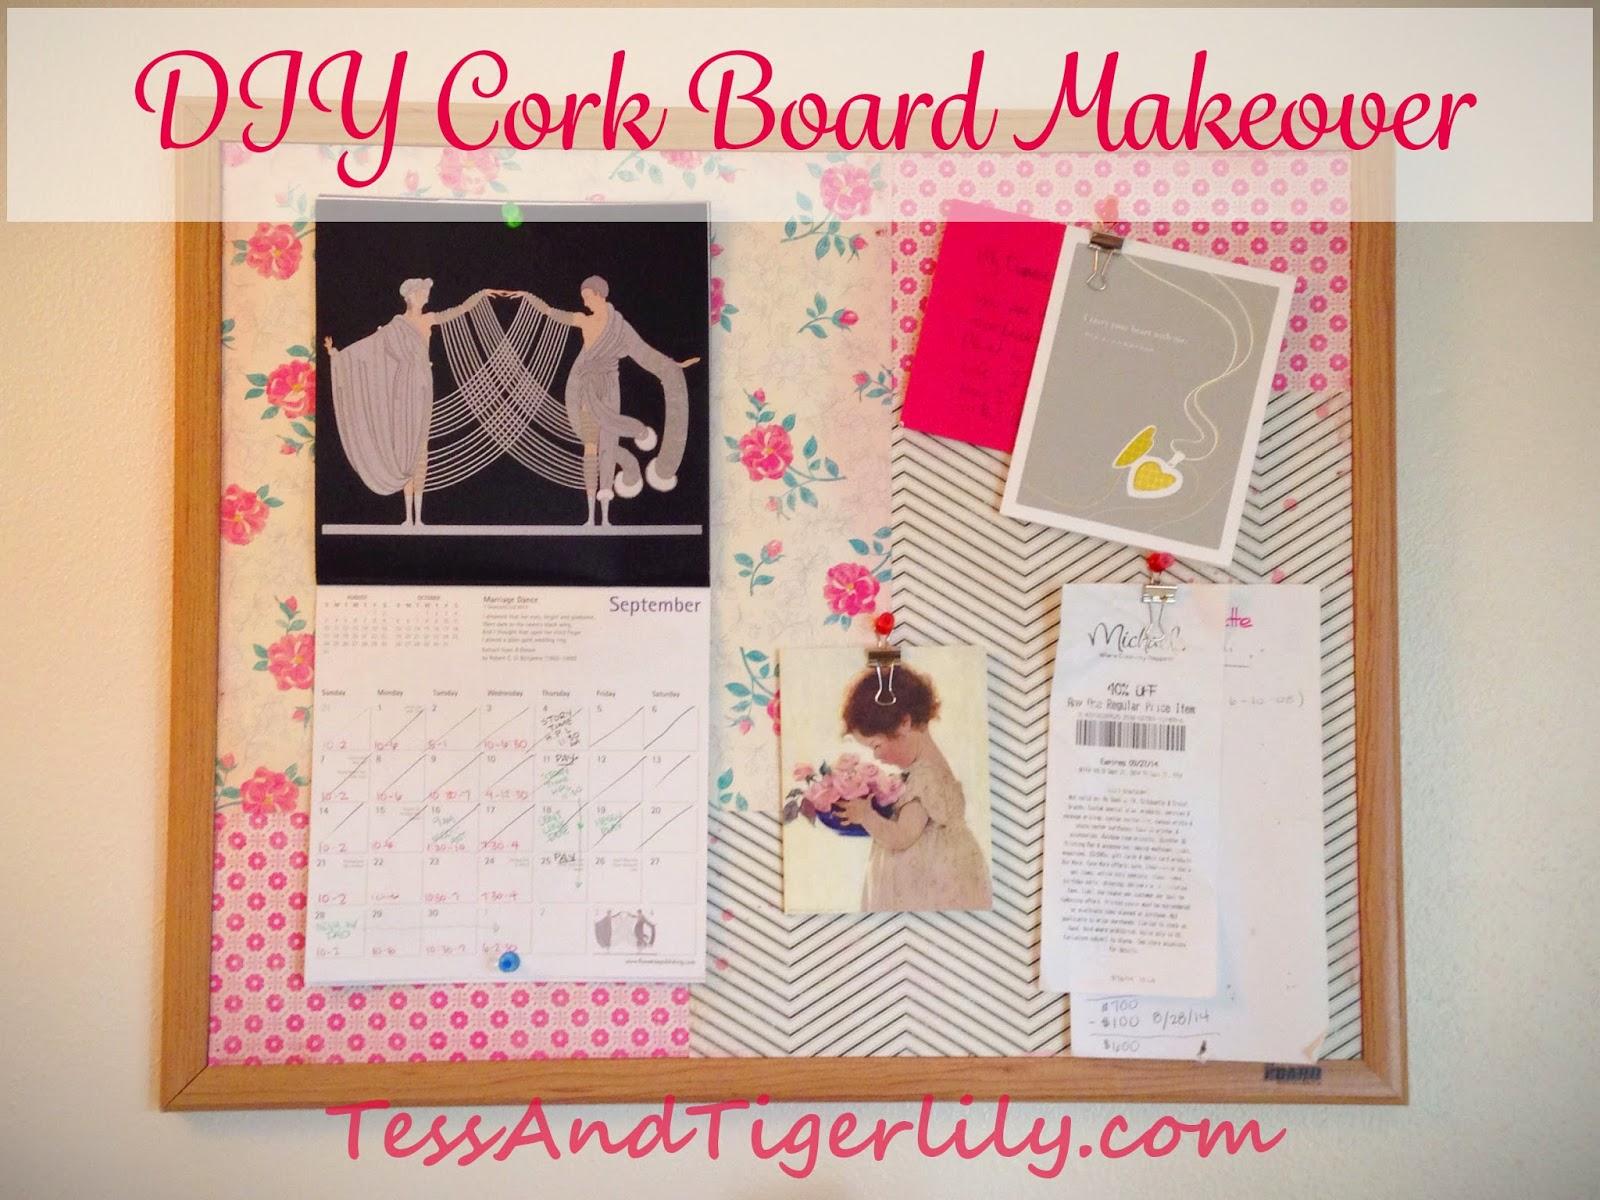 Scrapbook paper art projects - Diy Cork Board Makeover With Scrapbook Paper